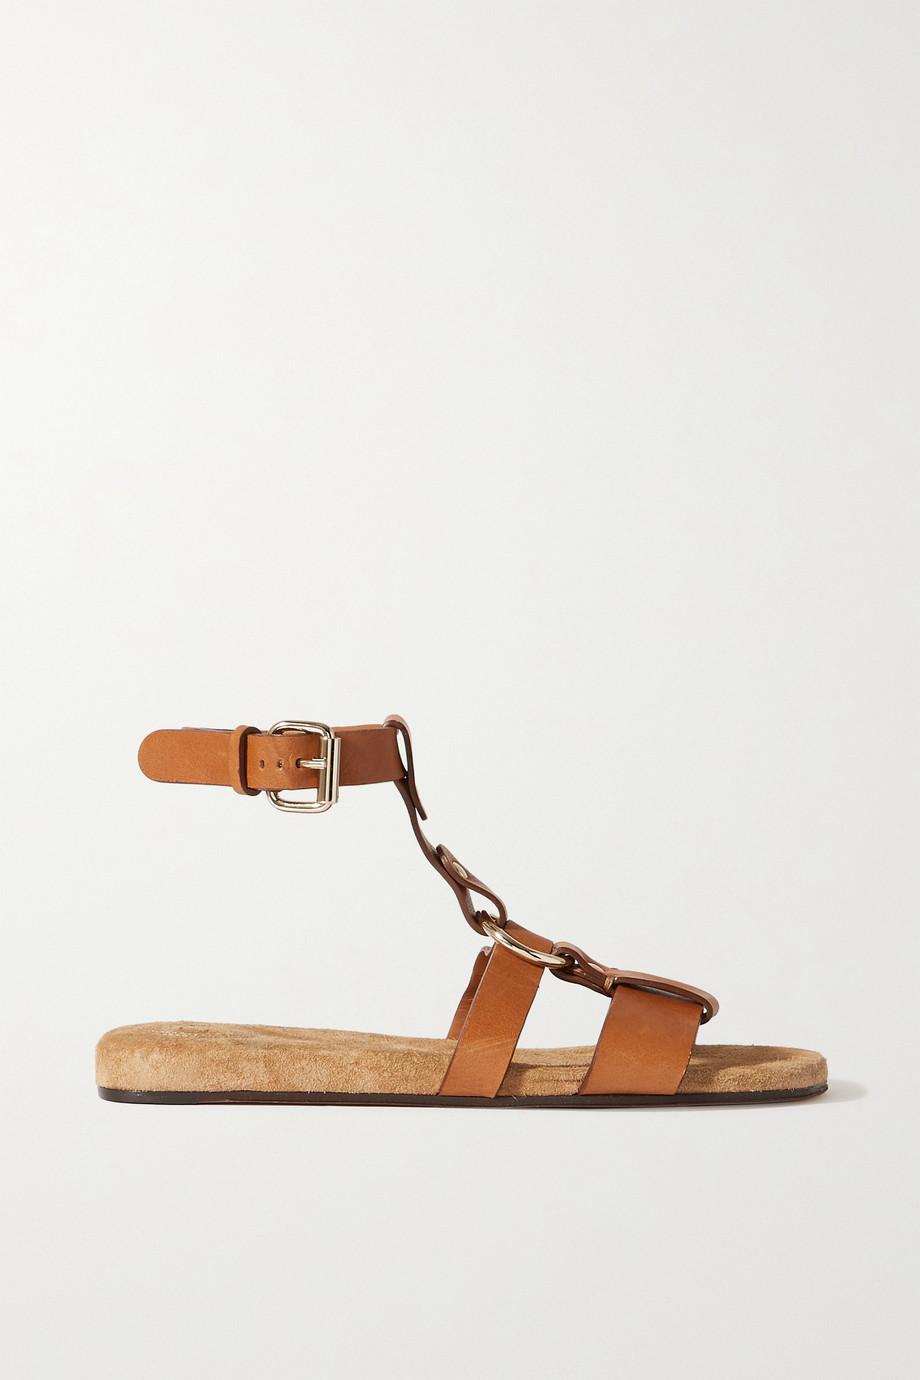 Chloé Diane leather sandals